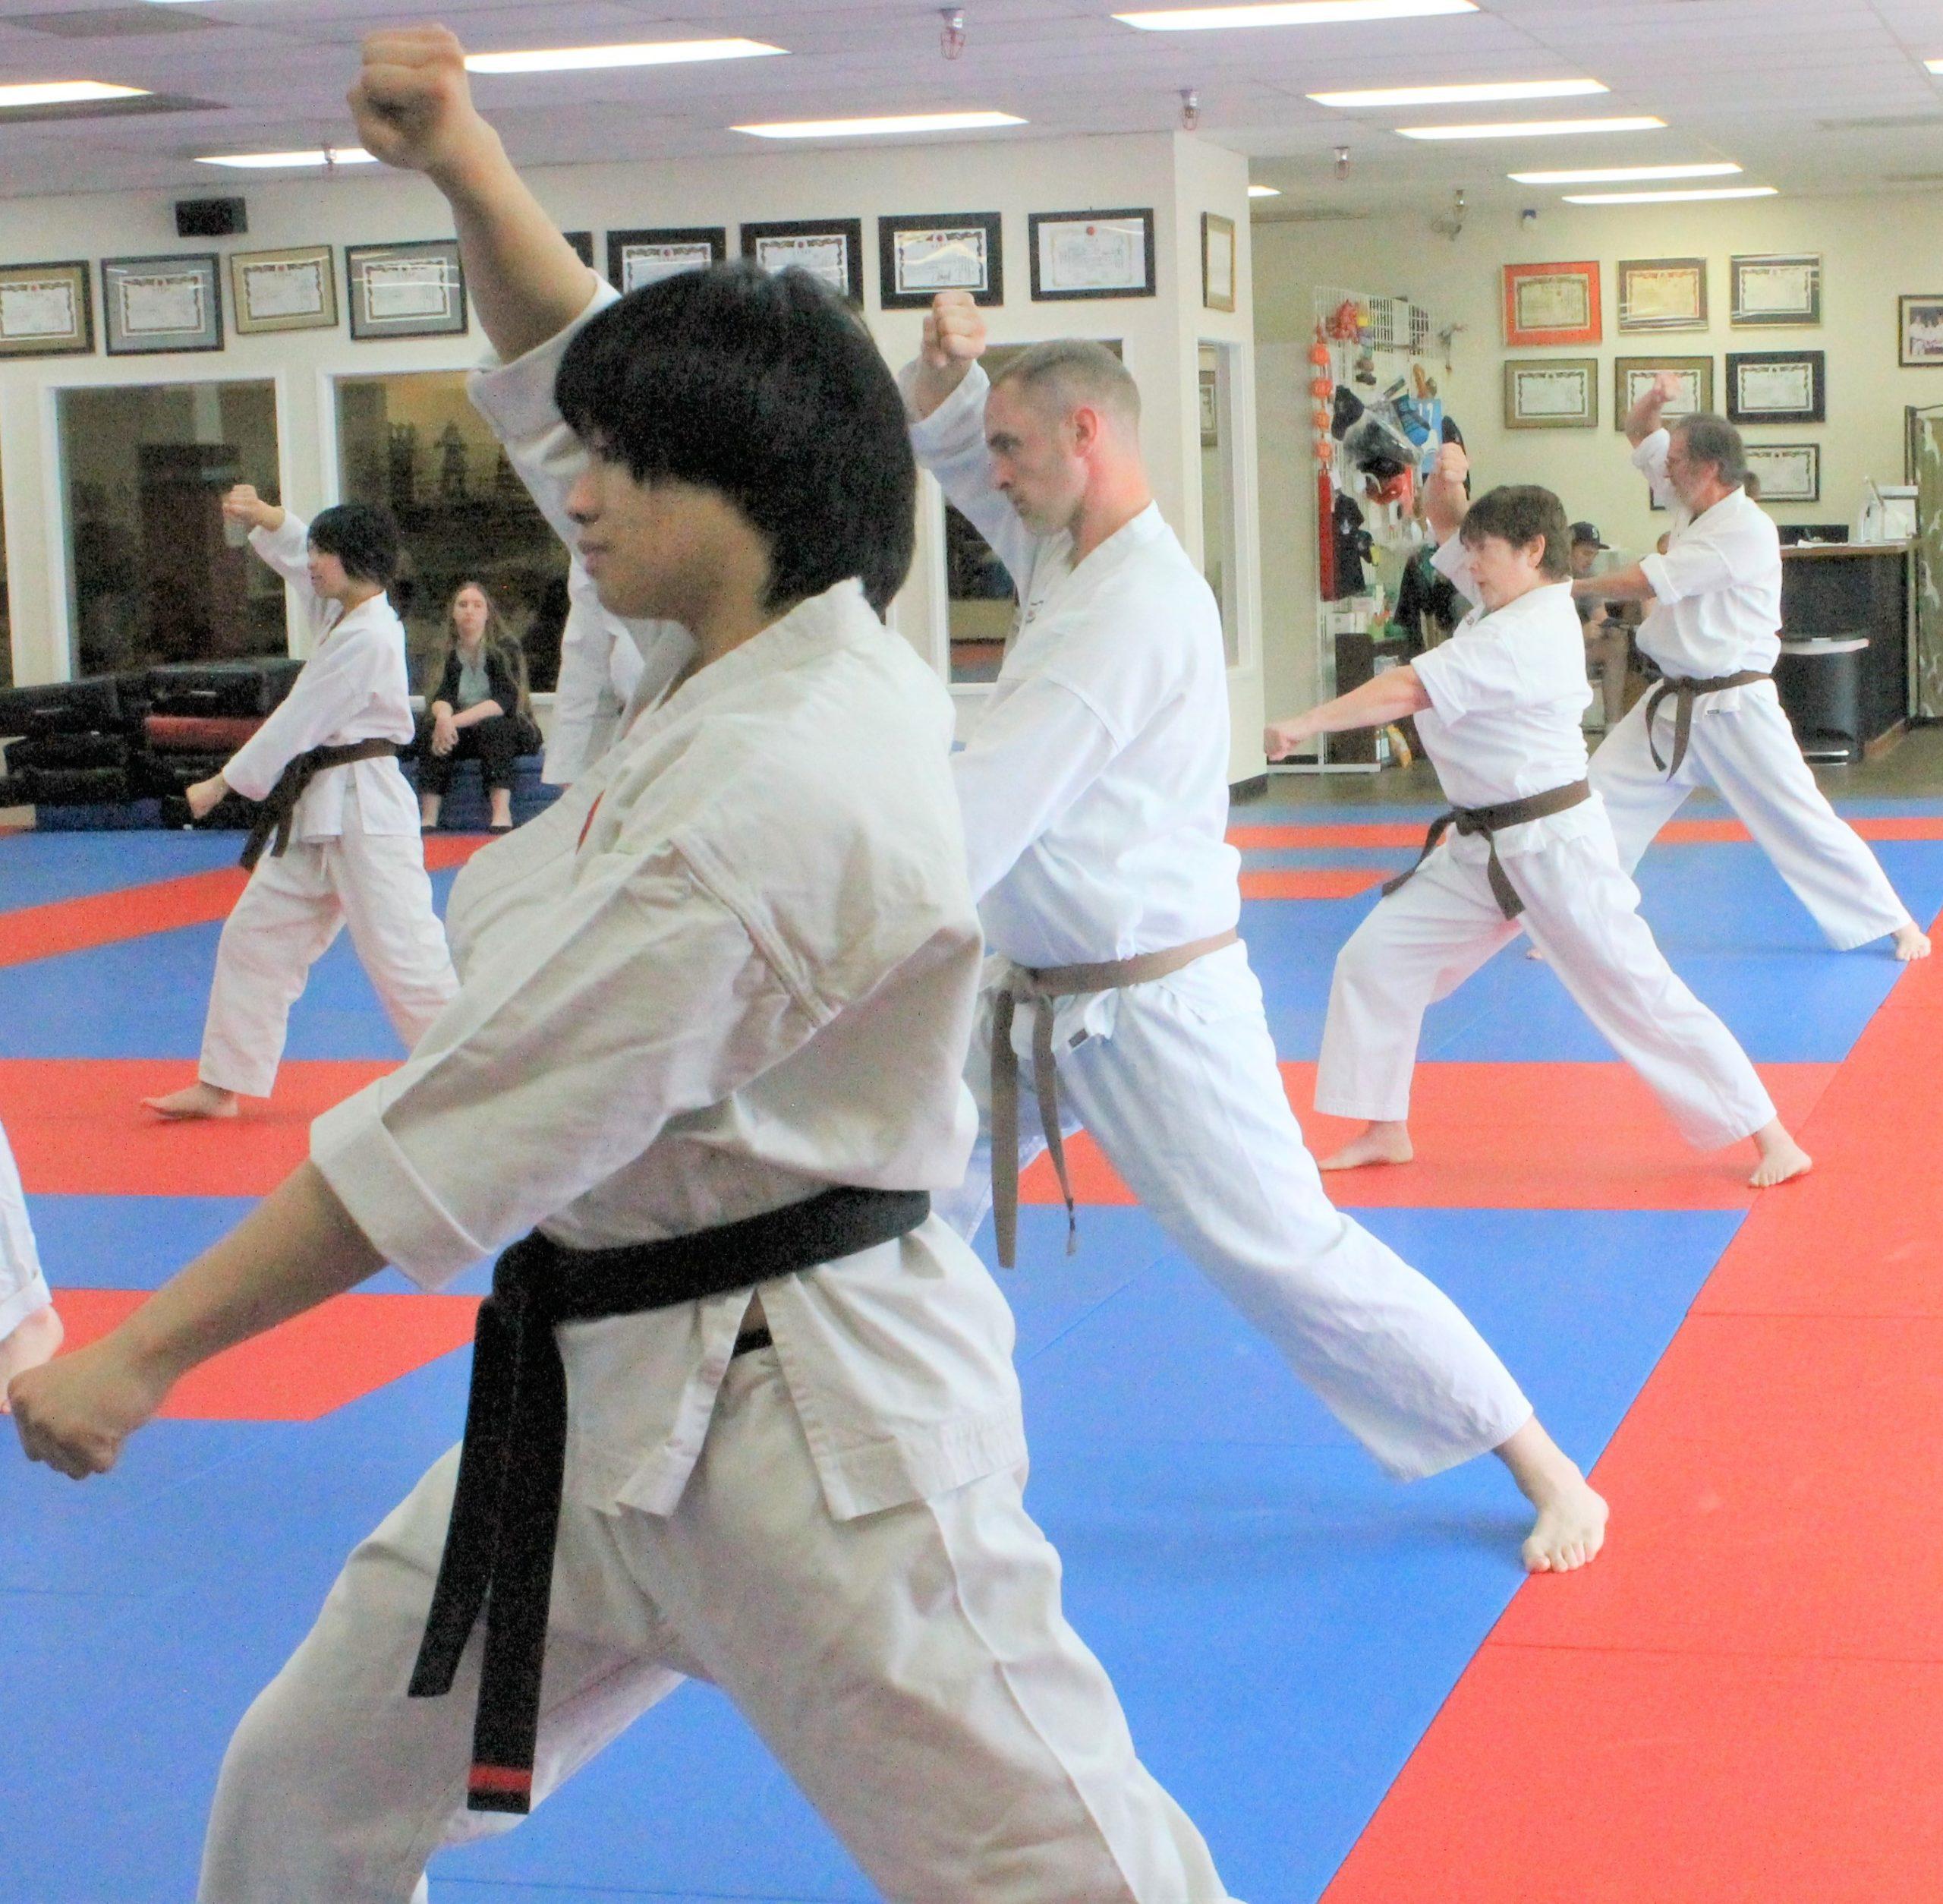 IMG 2950 3 Scaled, Fairwood Martial Arts